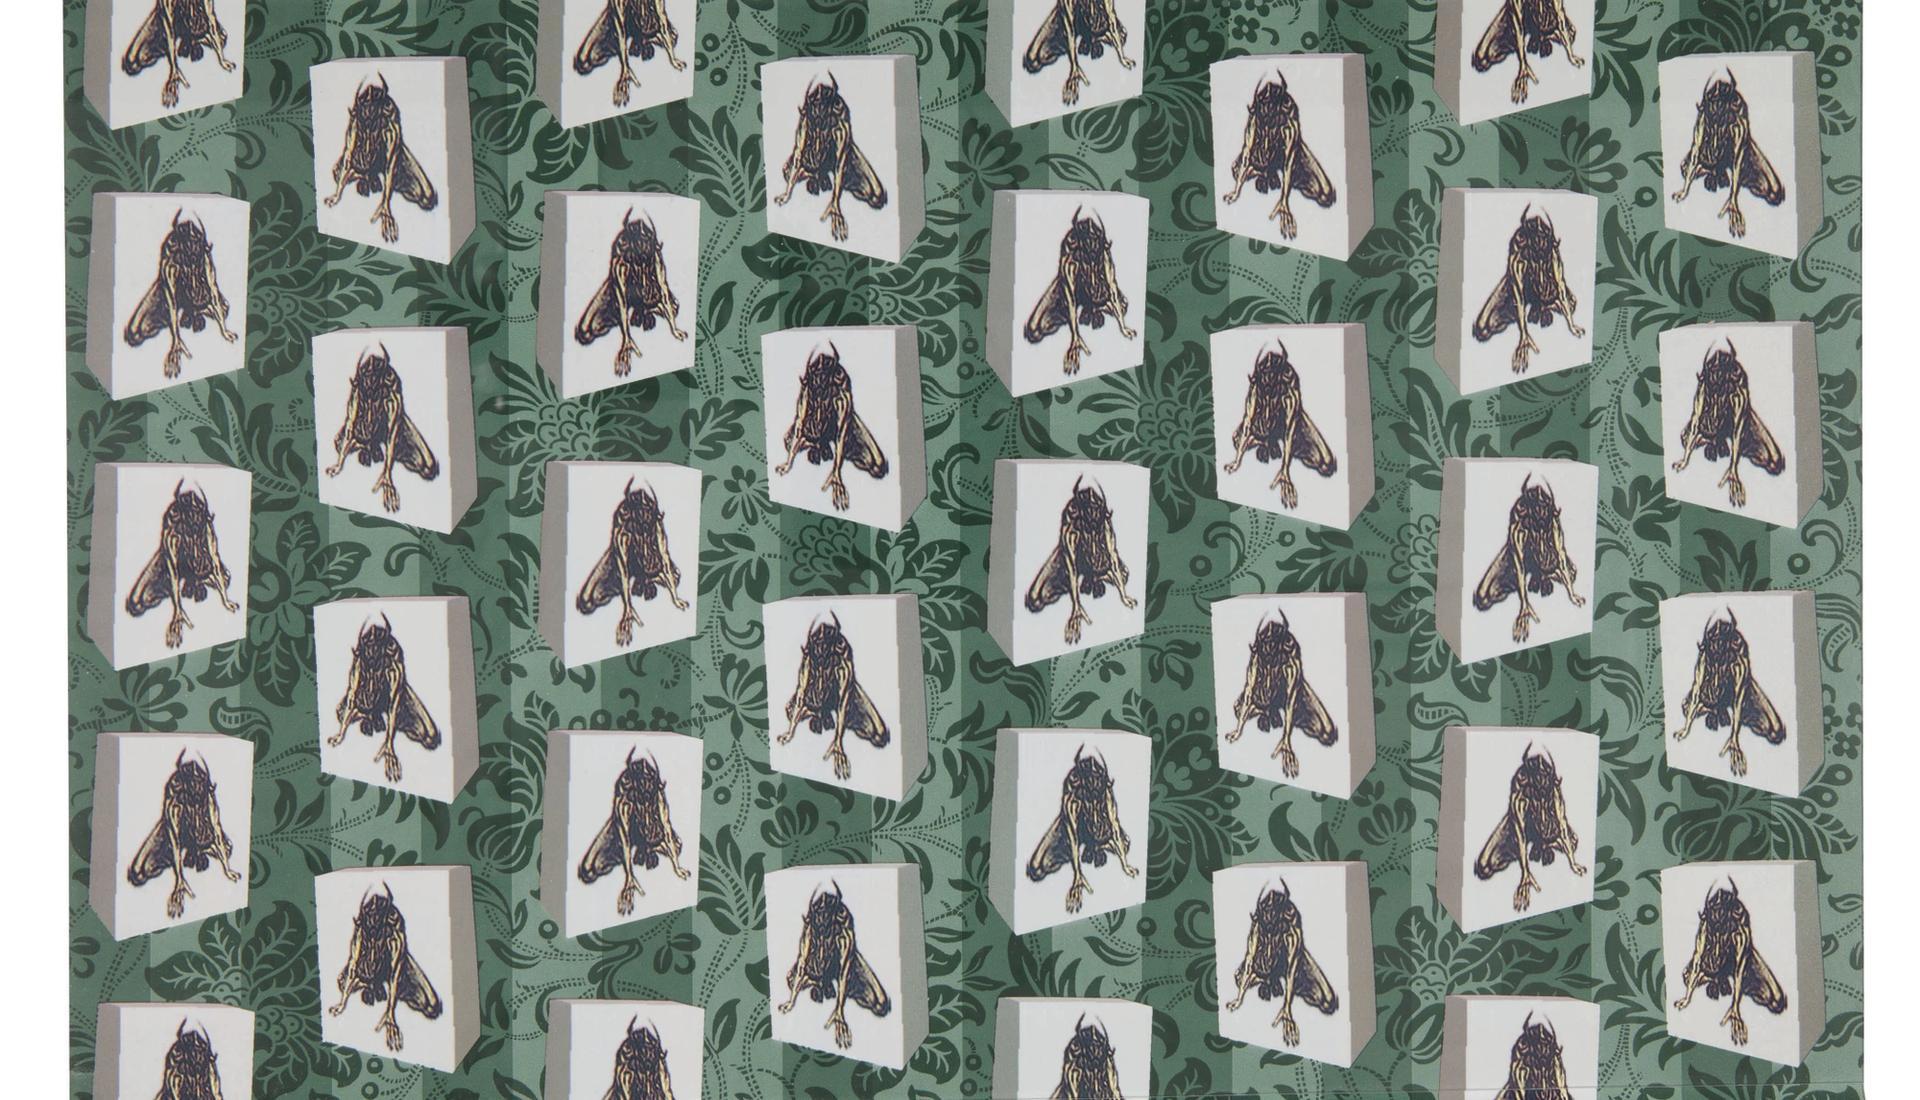 David Bowie, Minotaur wallpaper courtesy Sotheby's